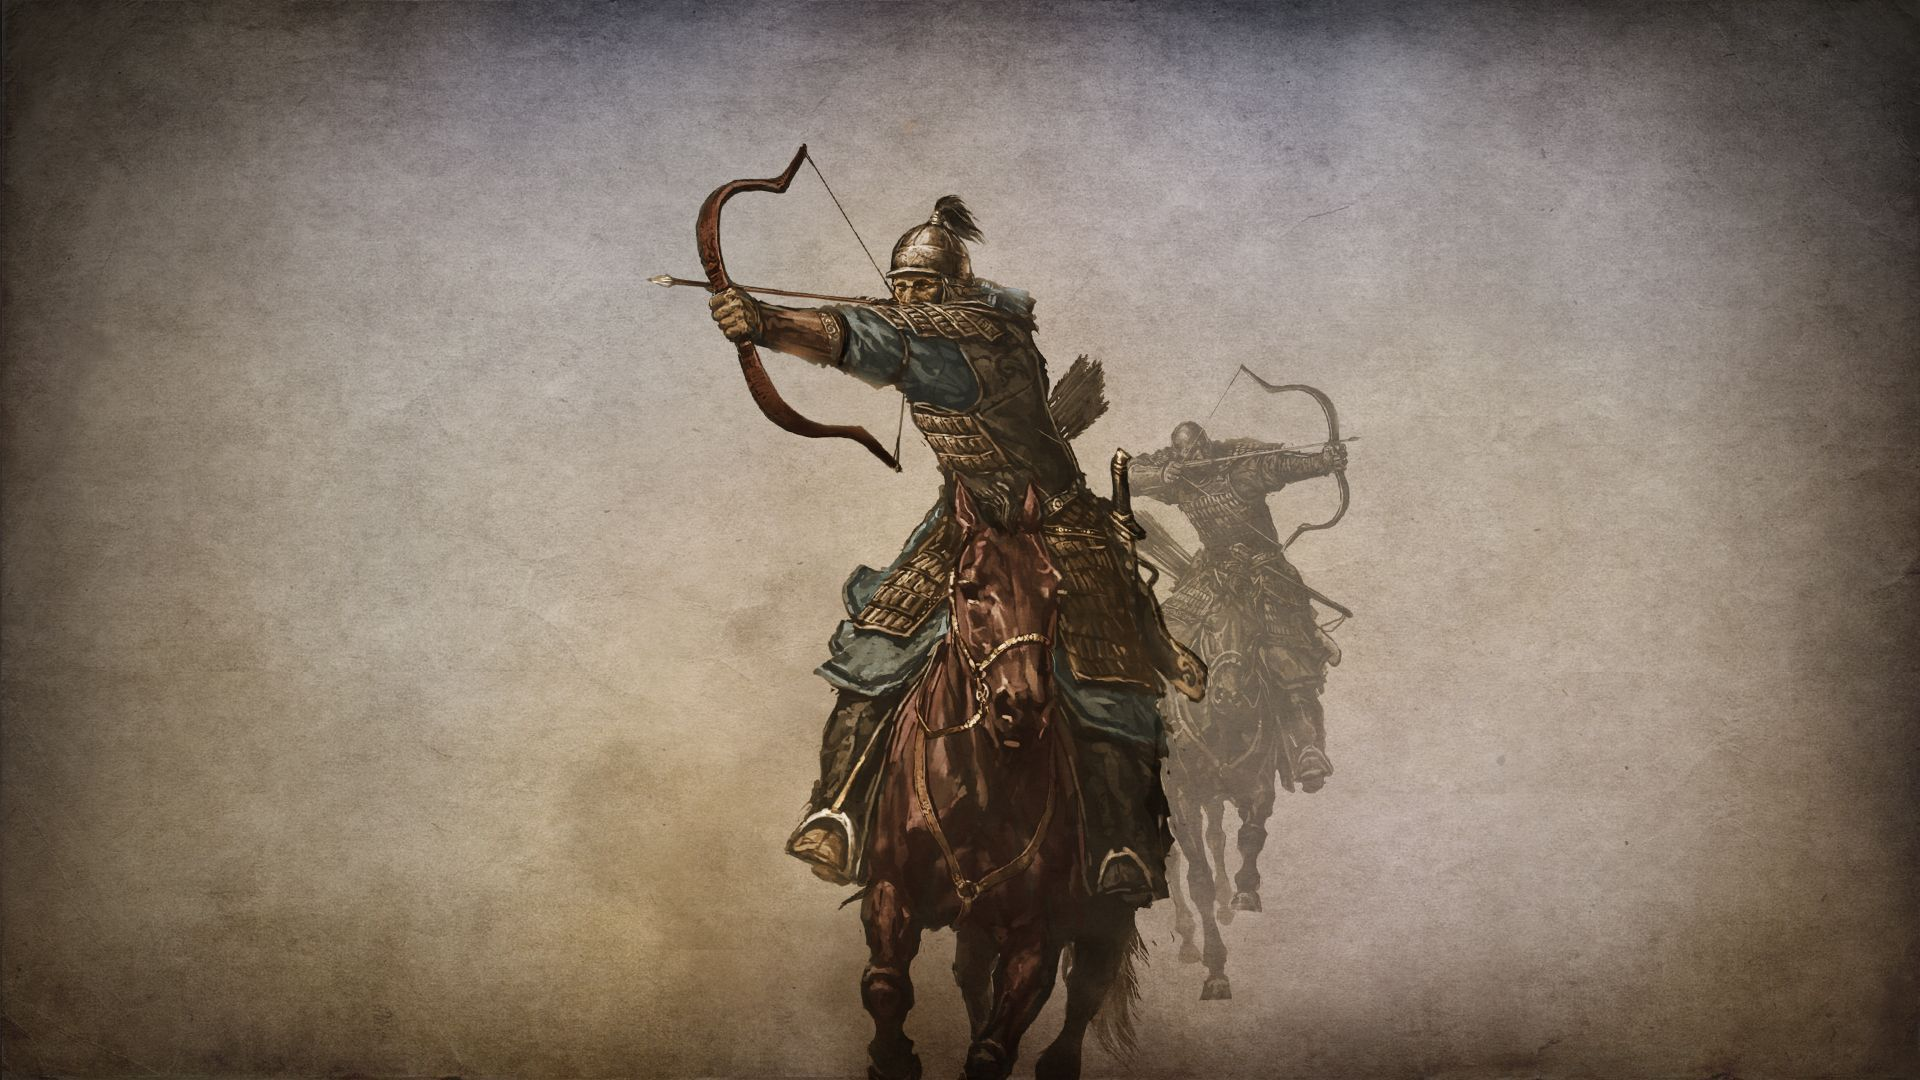 Mount & Blade: Warband sistem gereksinimleri